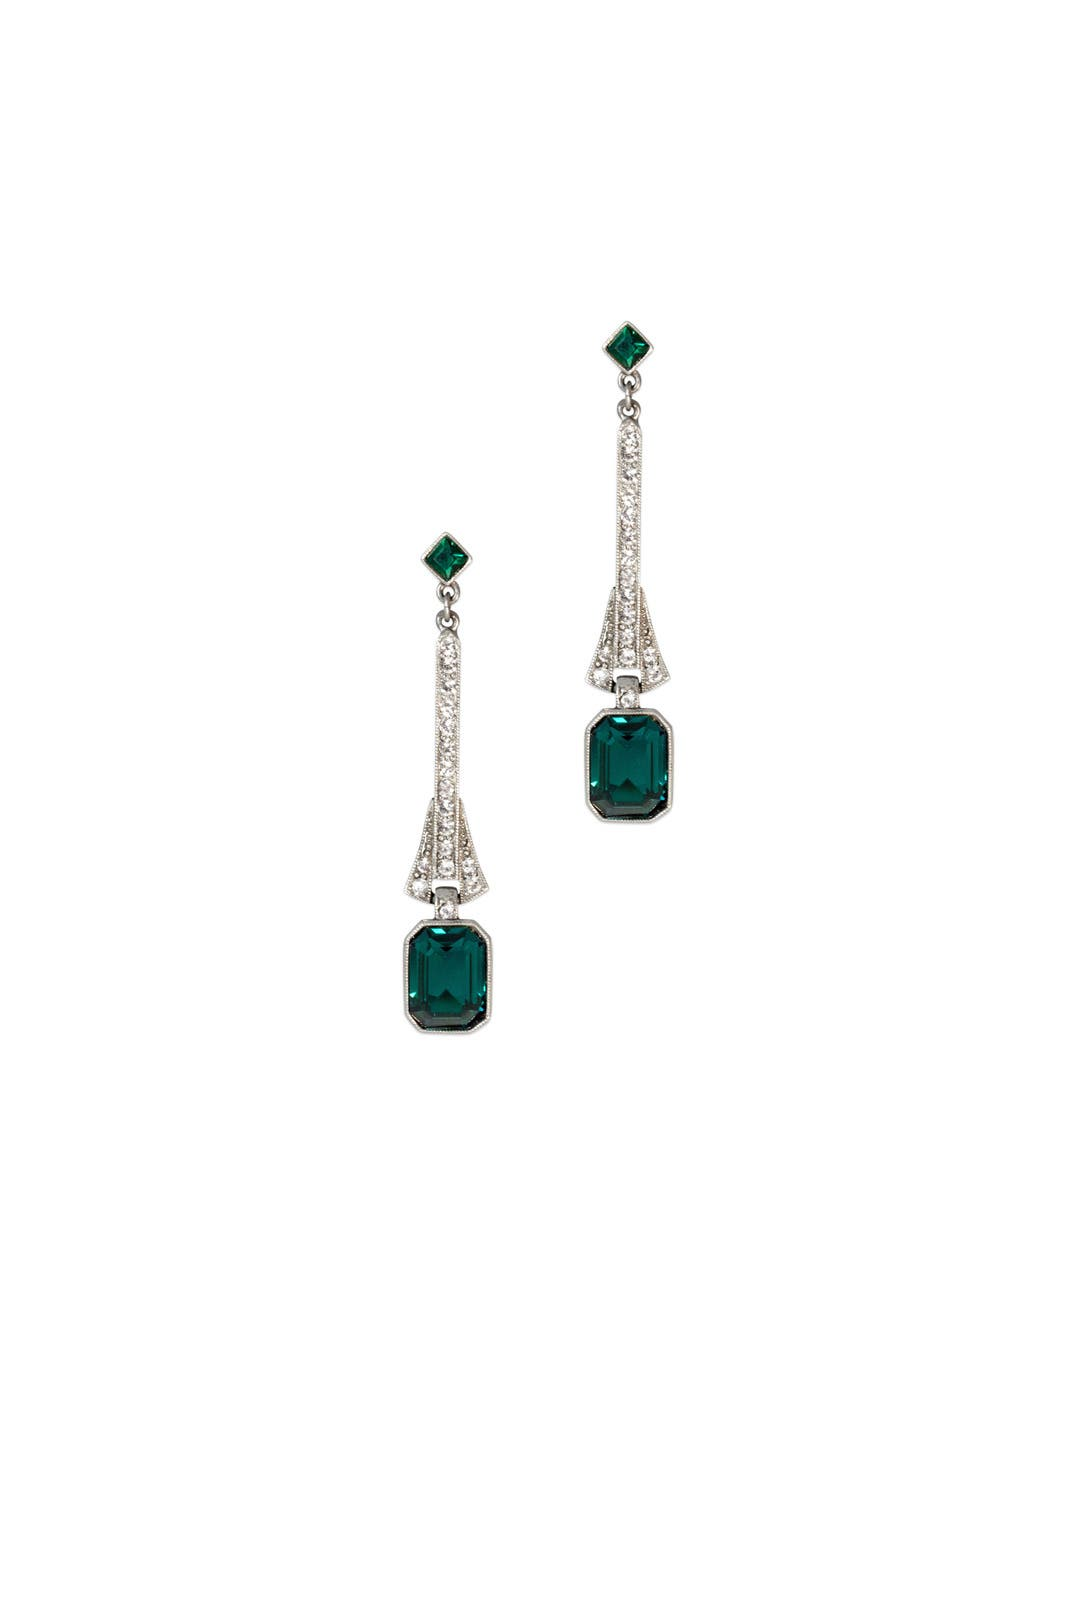 Linear Emerald Drops by Ben-Amun